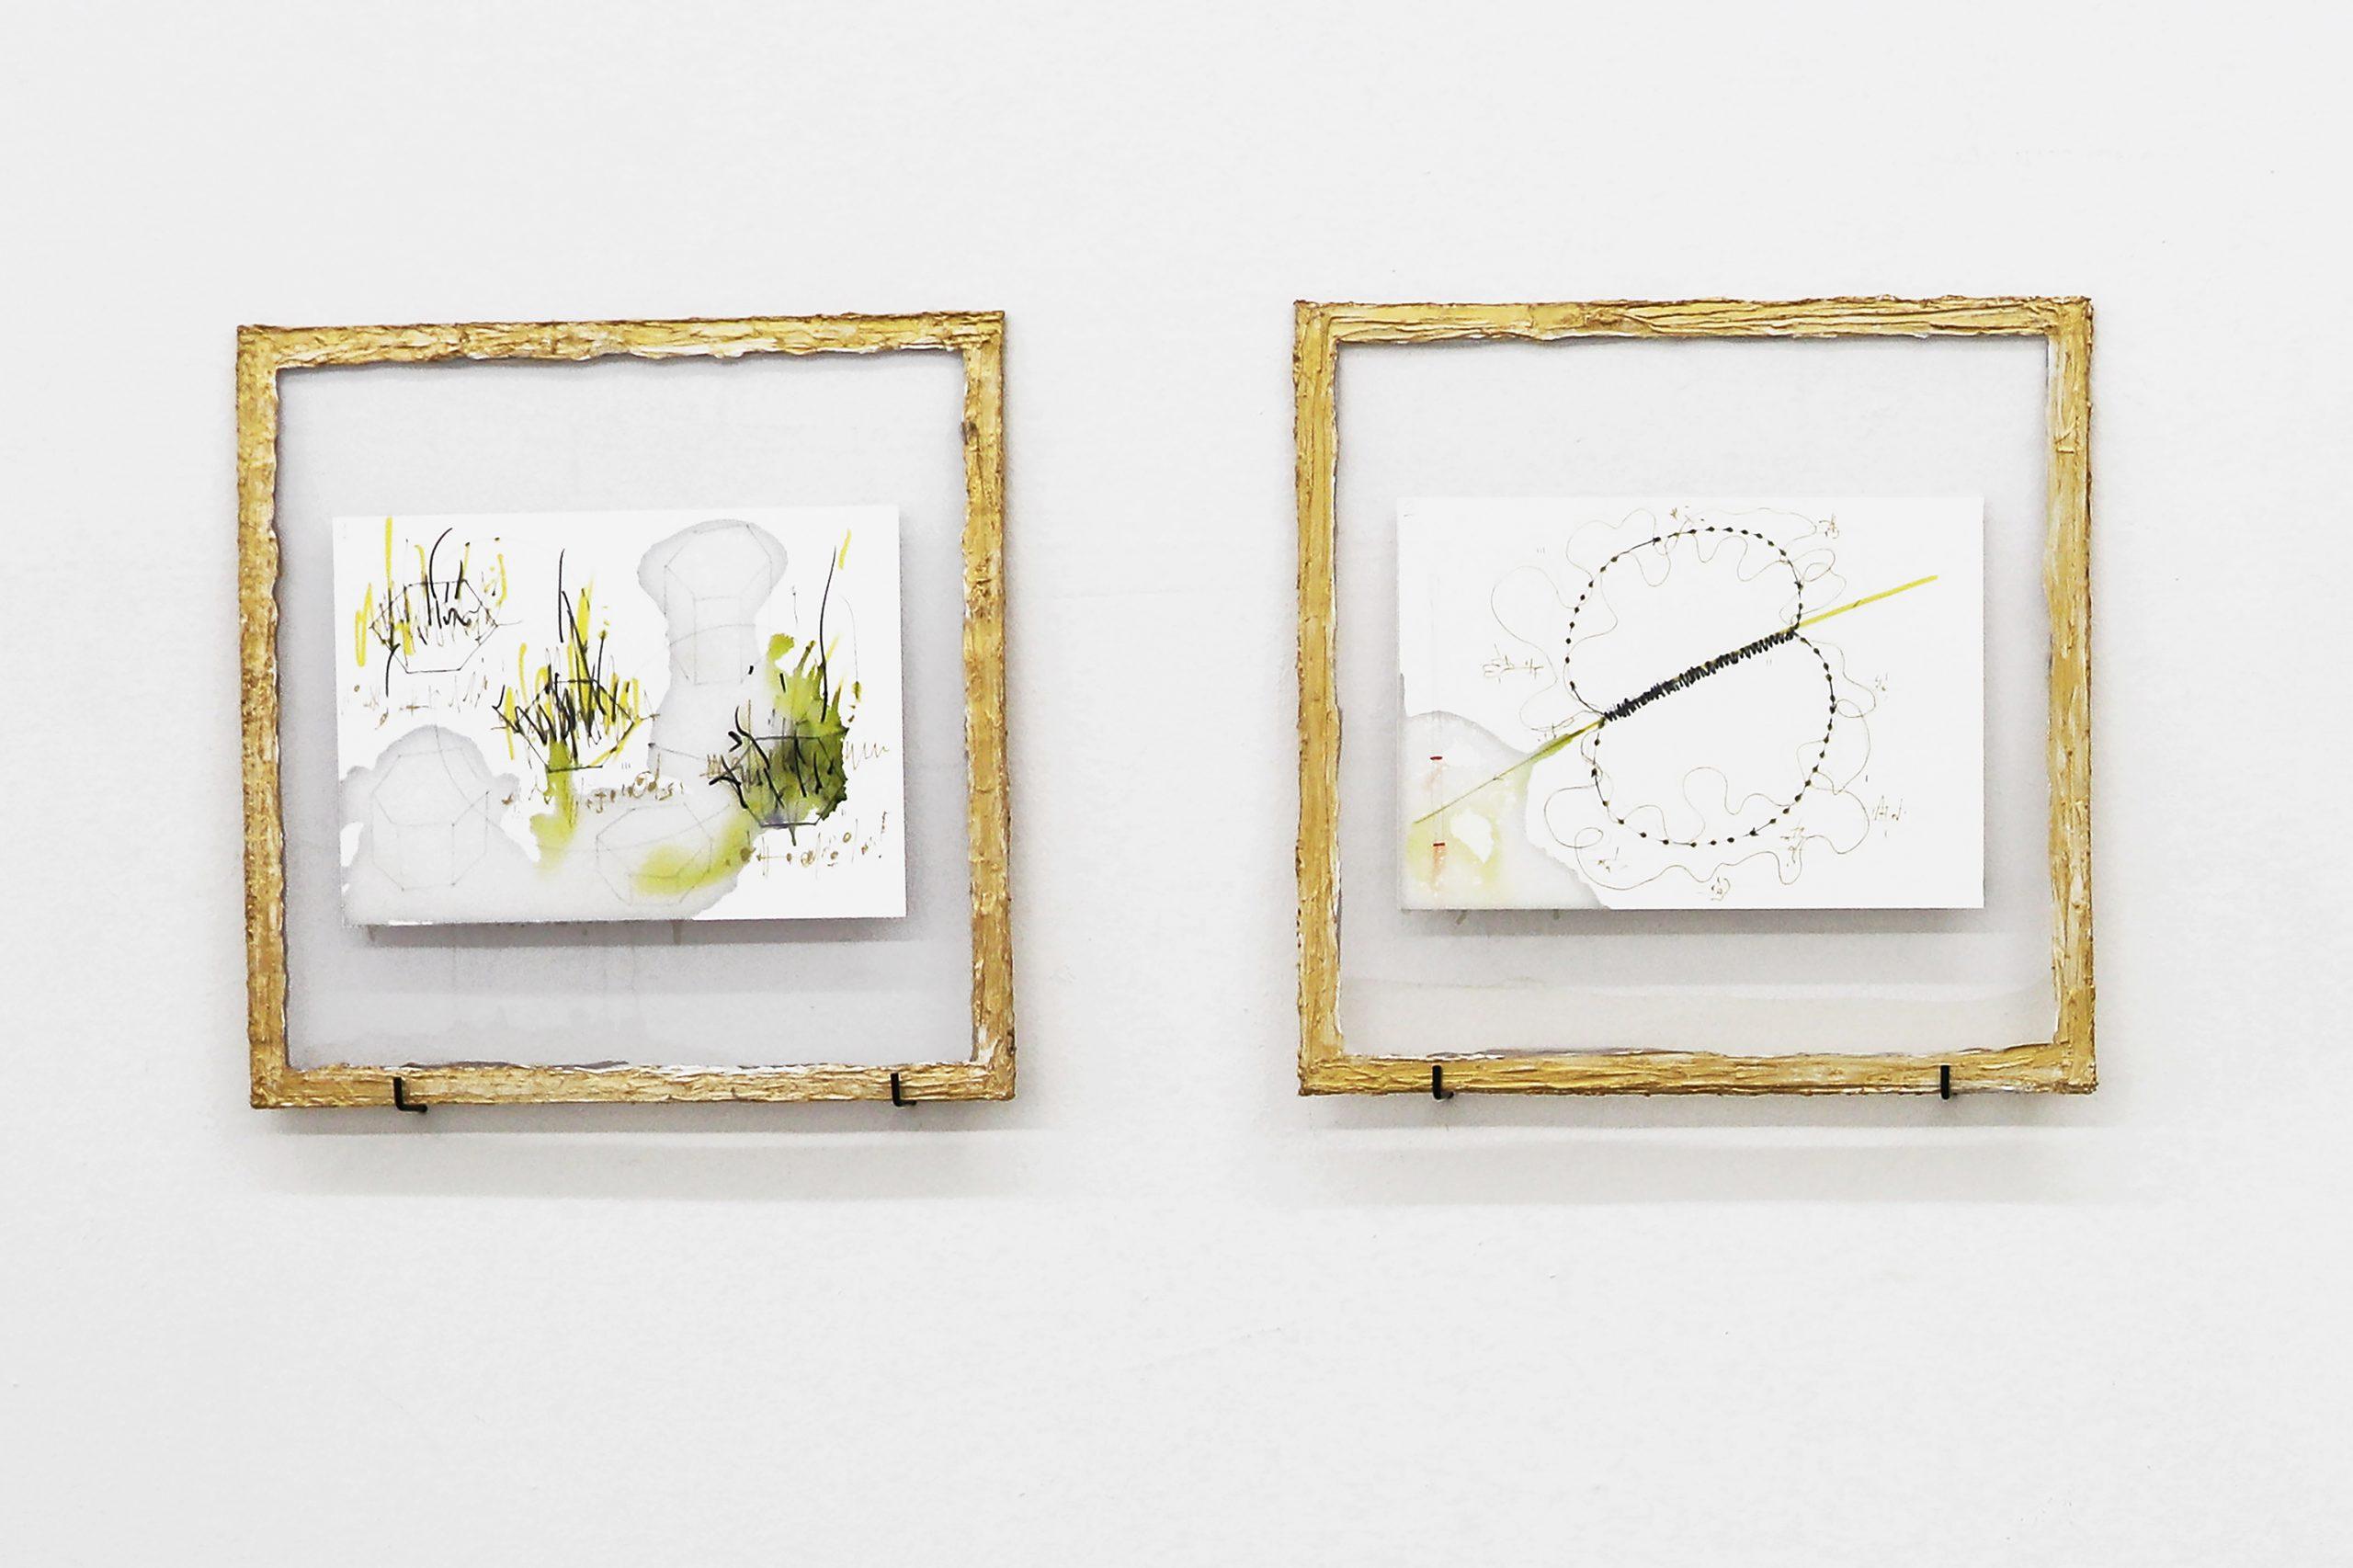 C0039_Performance drawings 1-2_Luca Bosani x